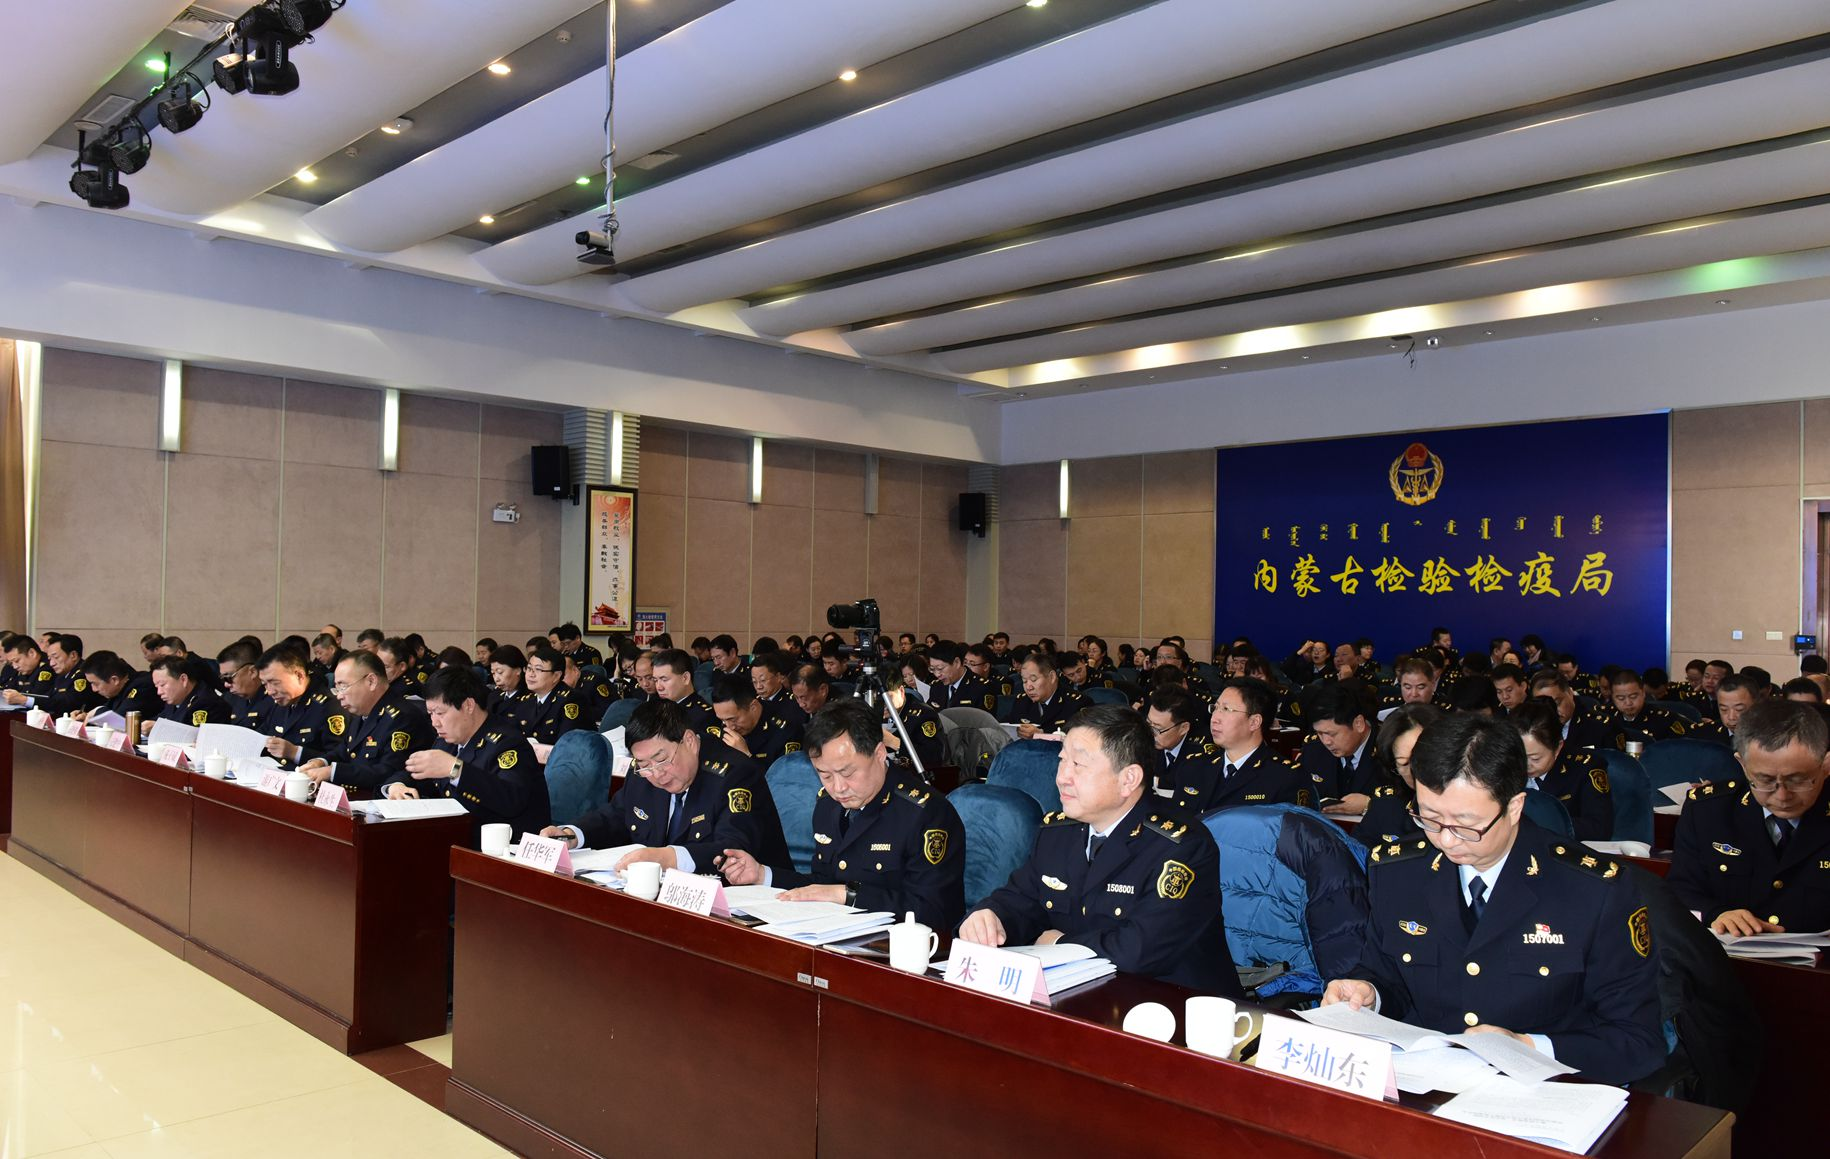 ZOBO卓邦为内蒙古检验检疫局指挥中心和报告厅打造高品质音视频系统